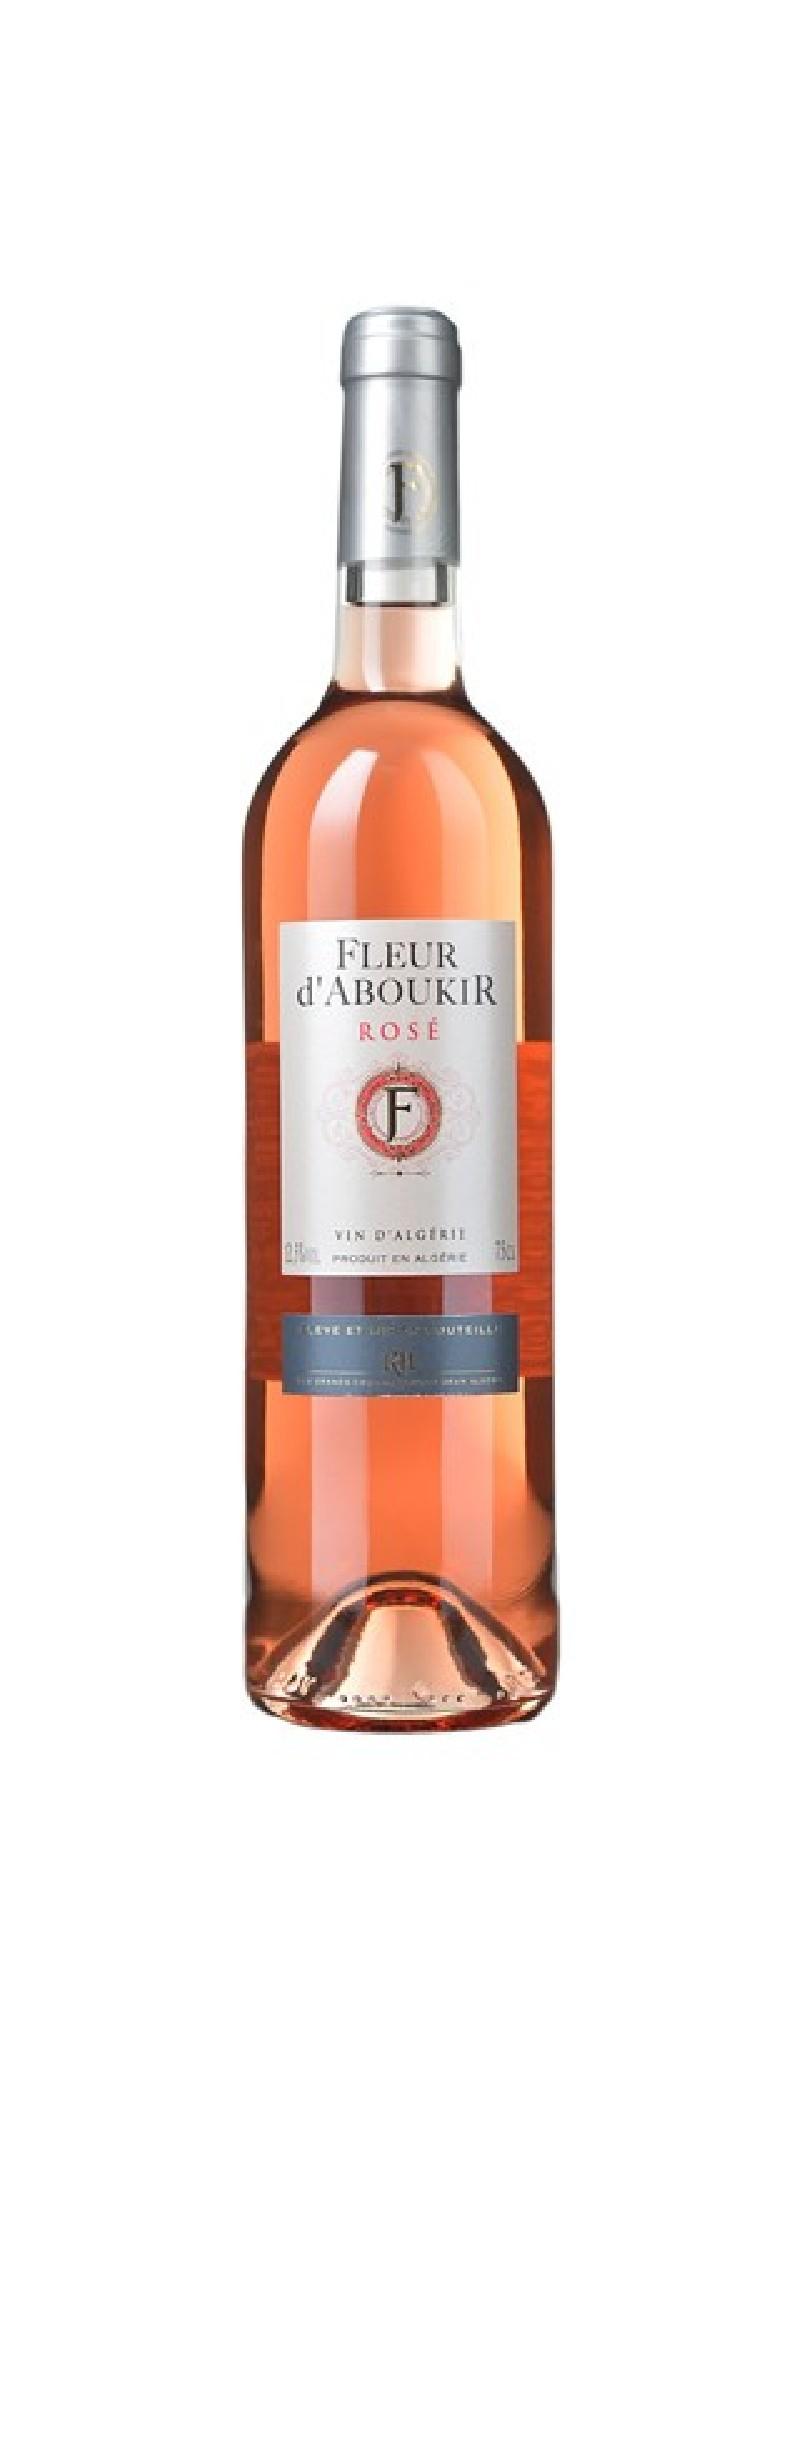 flower of aboukir - algerian wine